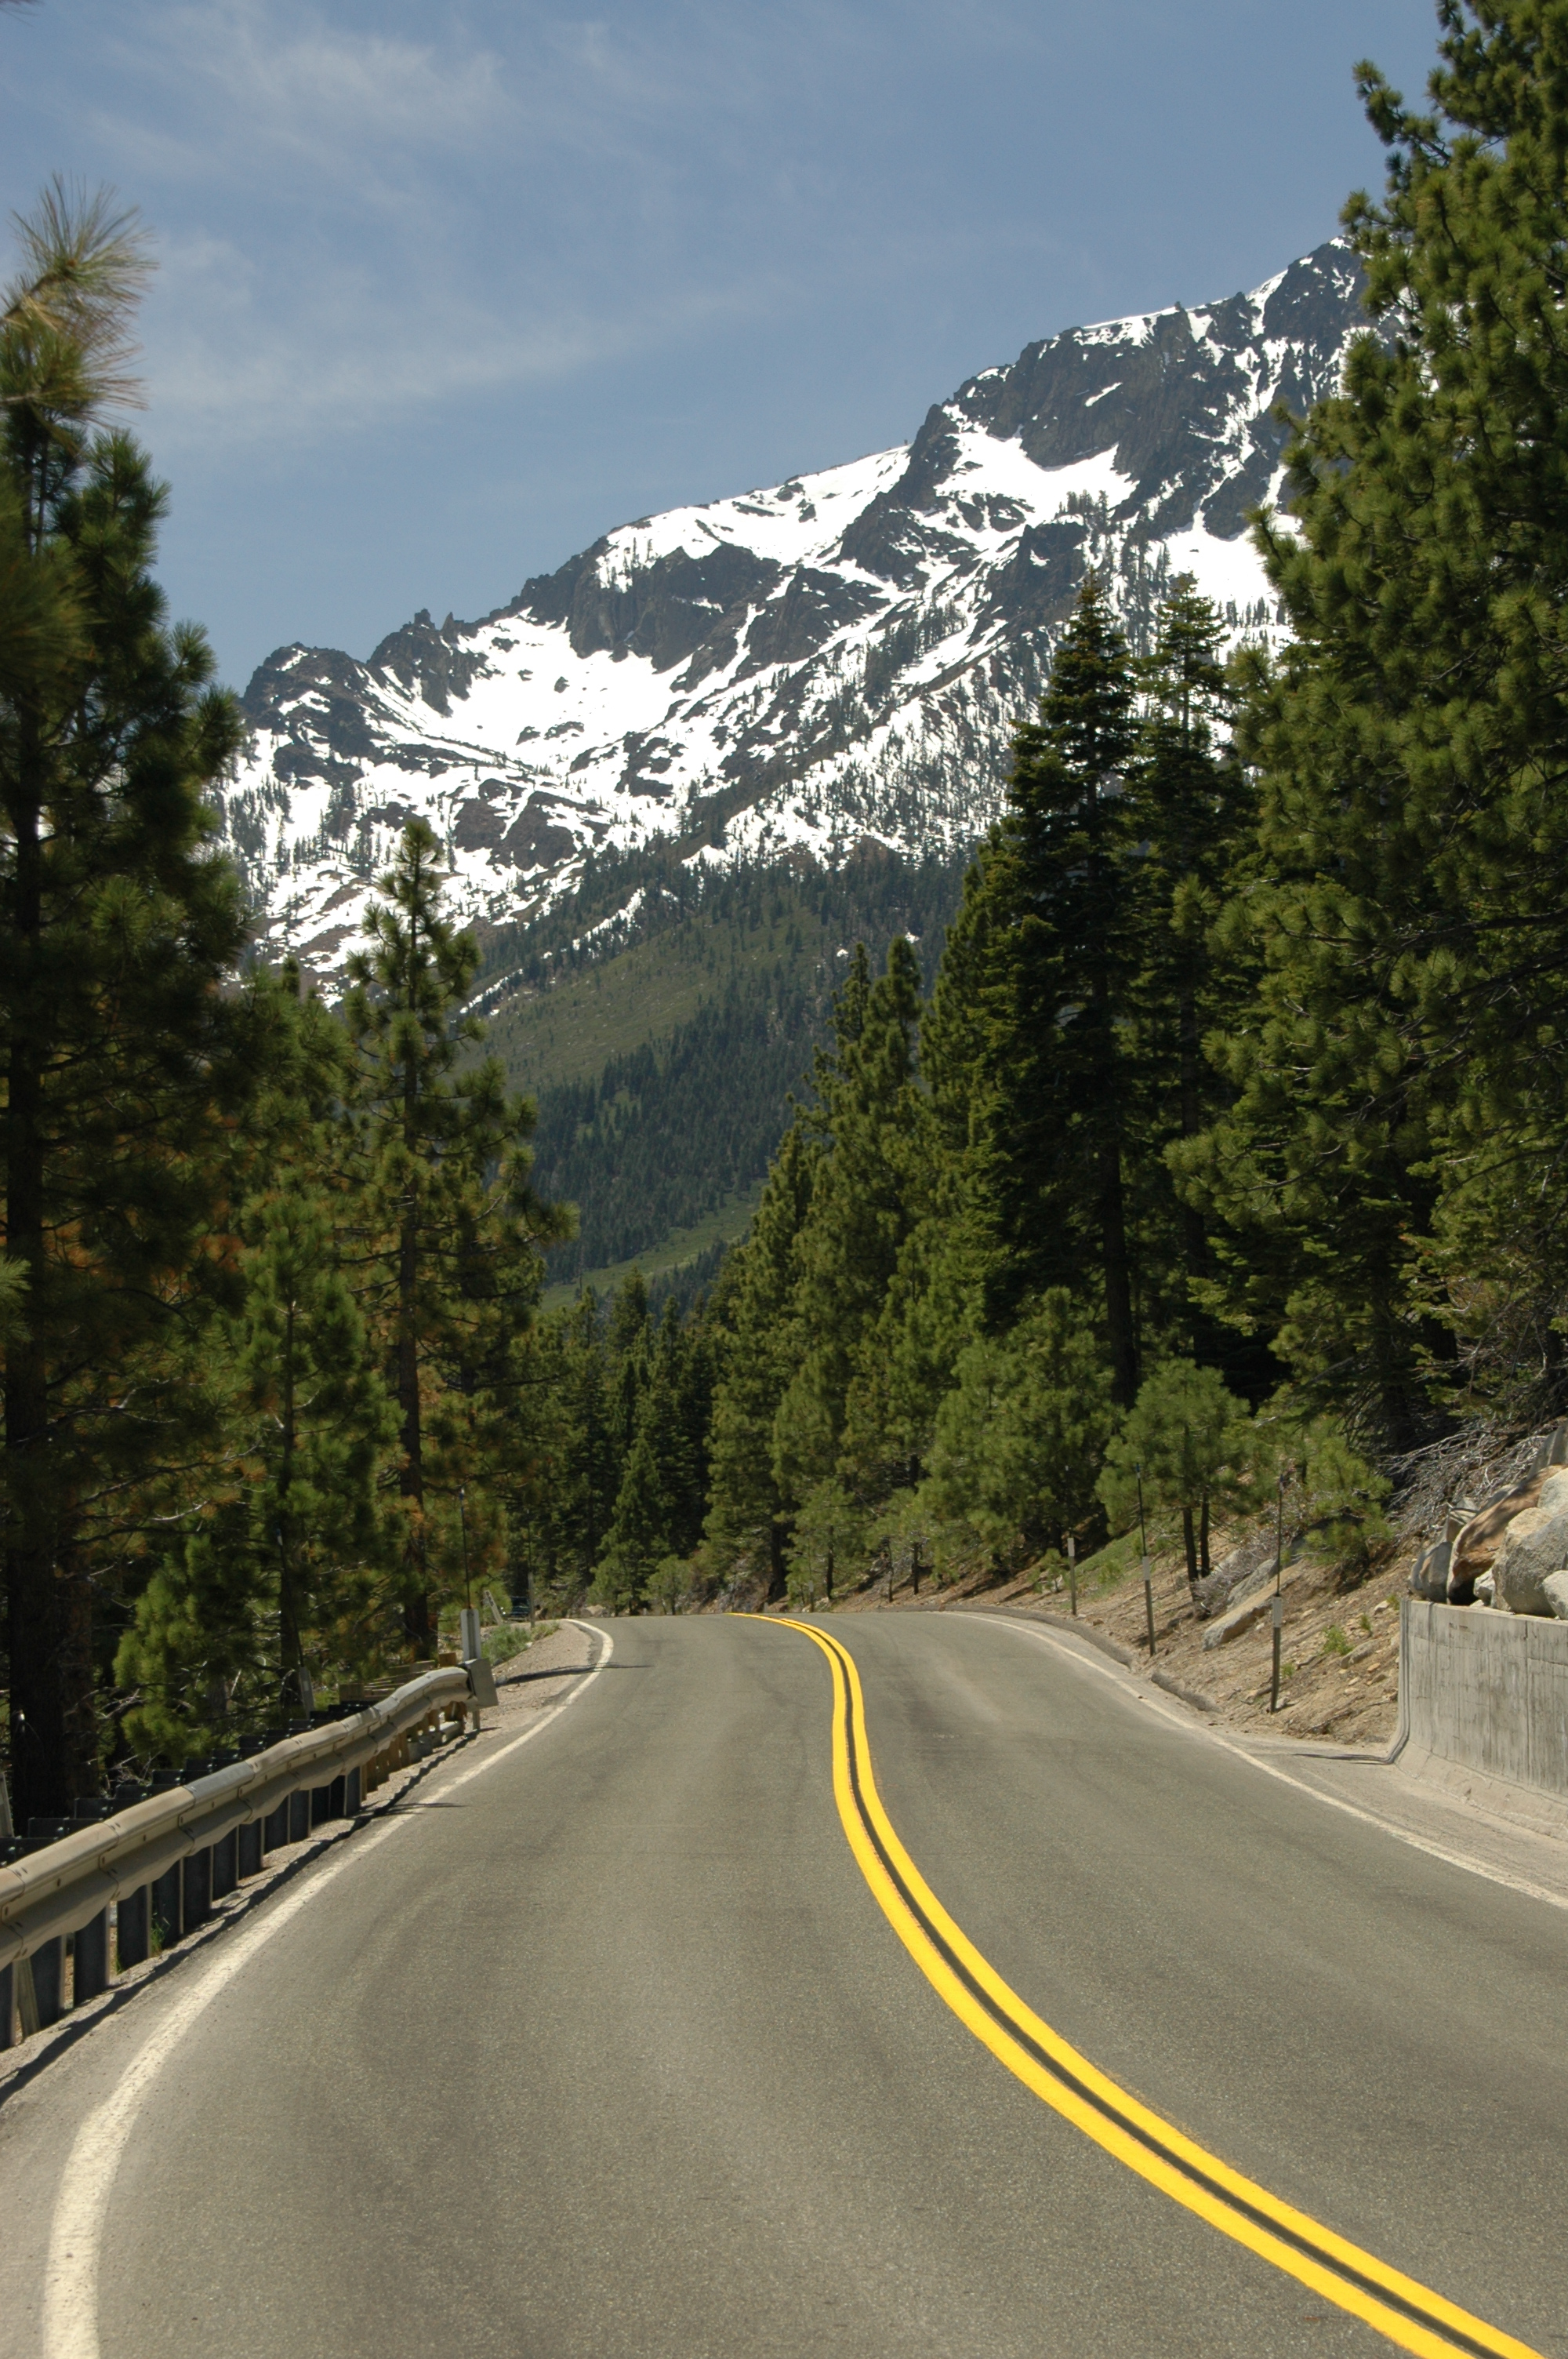 Joe Dobrow photo of a winding mountain road in Lake Tahoe